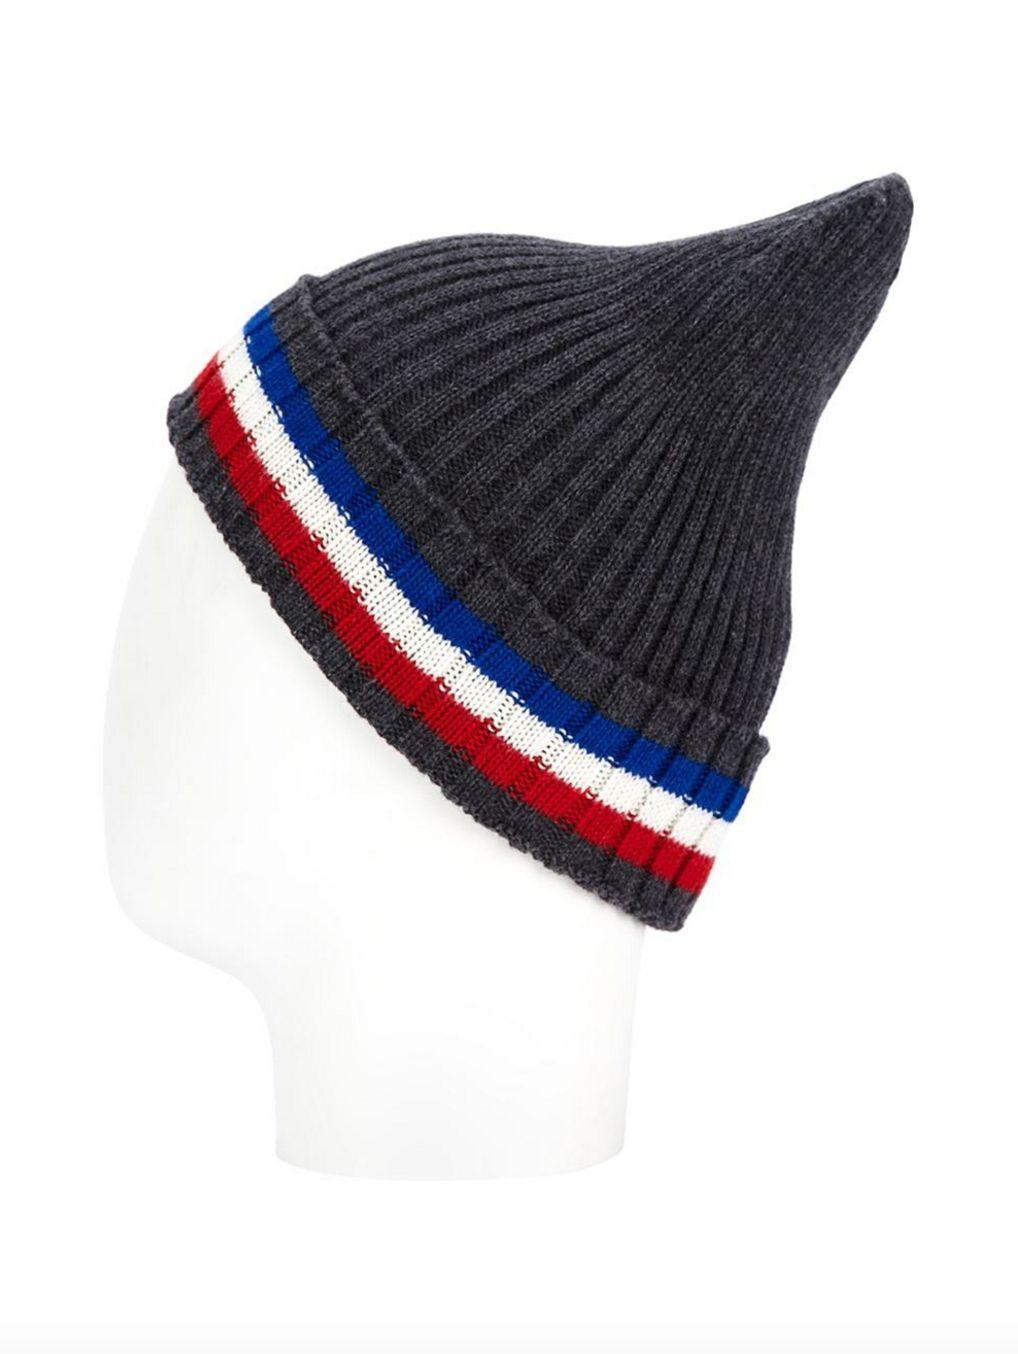 13b34f0aa82d78 Off-white c_o Virgil Abloh Striped Beanie Hat Cap Off White Supreme Kanye  Bape